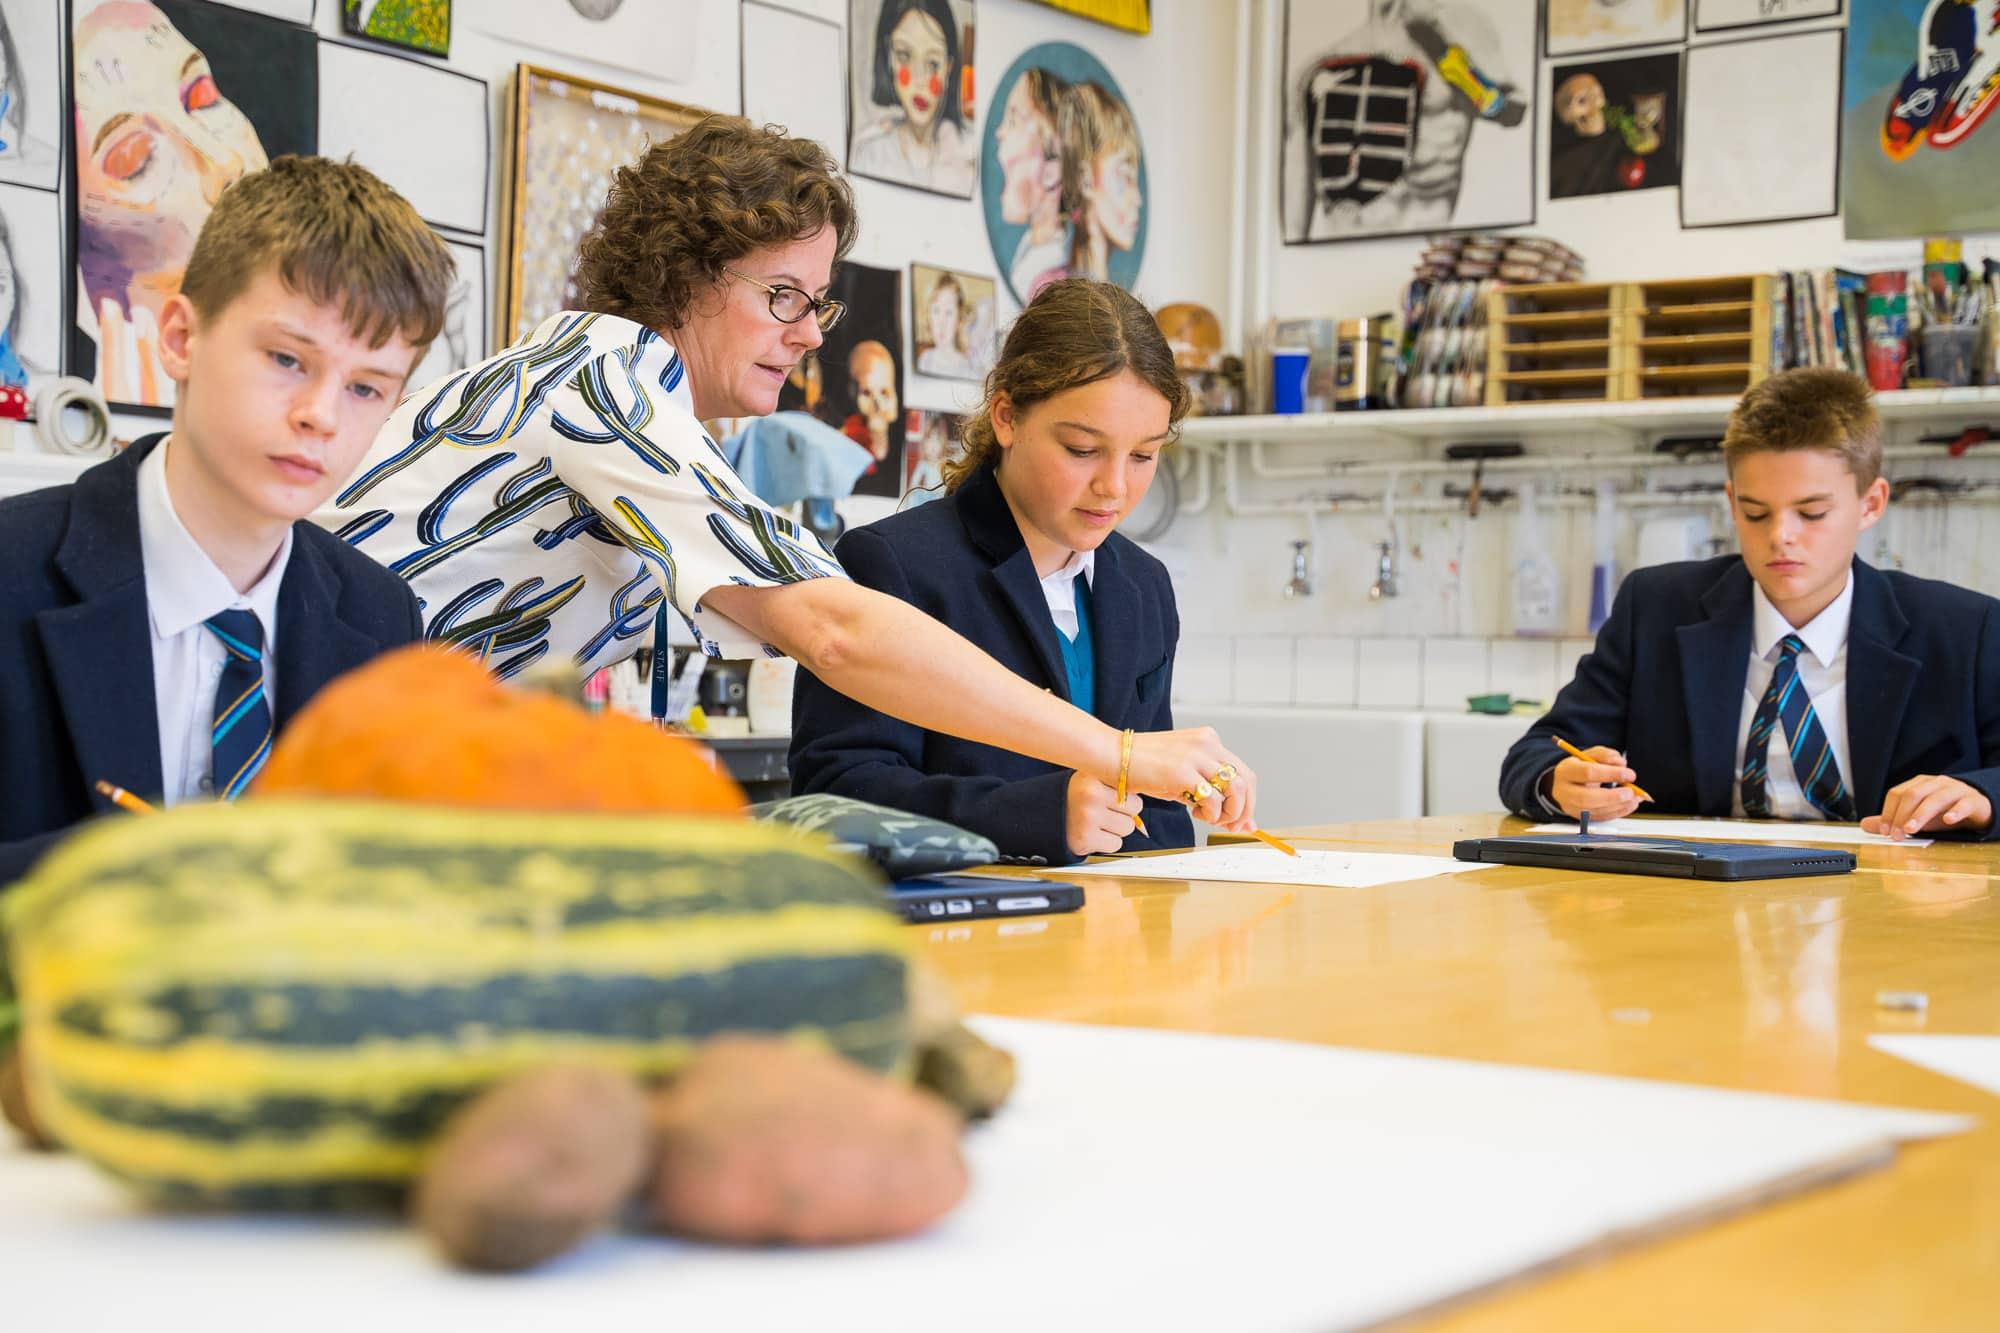 art teacher teaching students how to paint vegetables